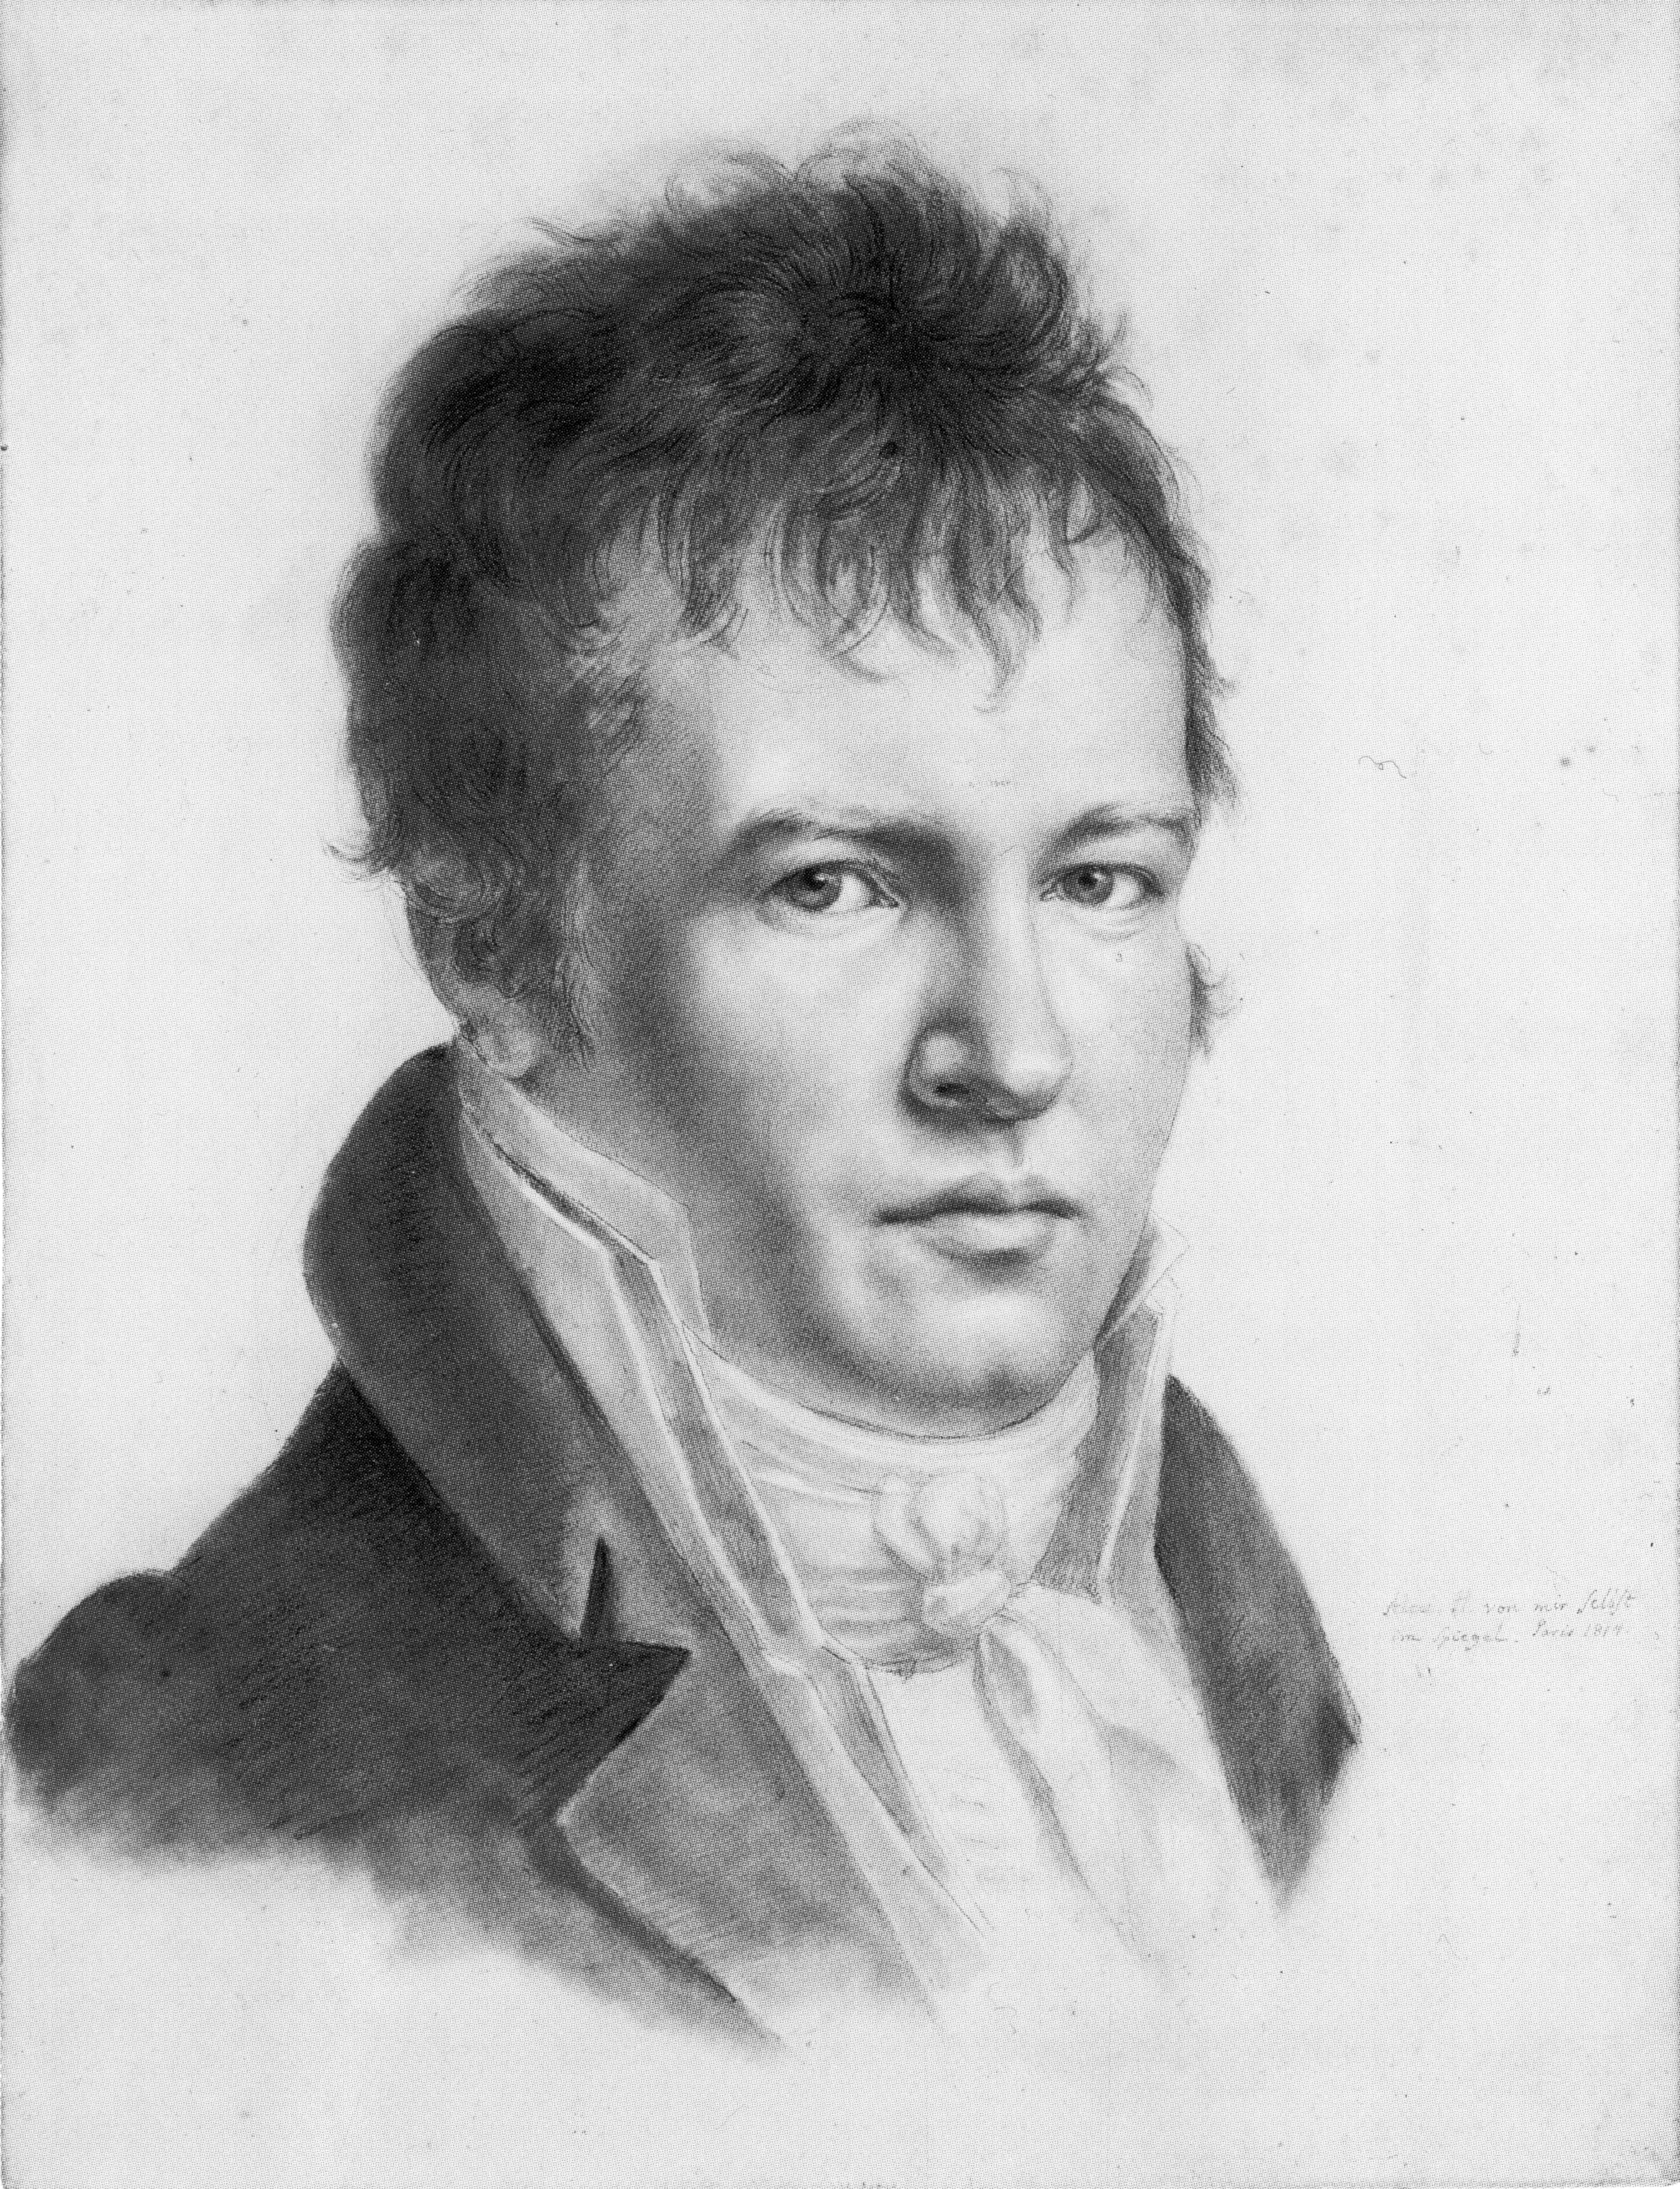 File:Alexander von Humboldt-selfportrait.jpg - Wikimedia Commons